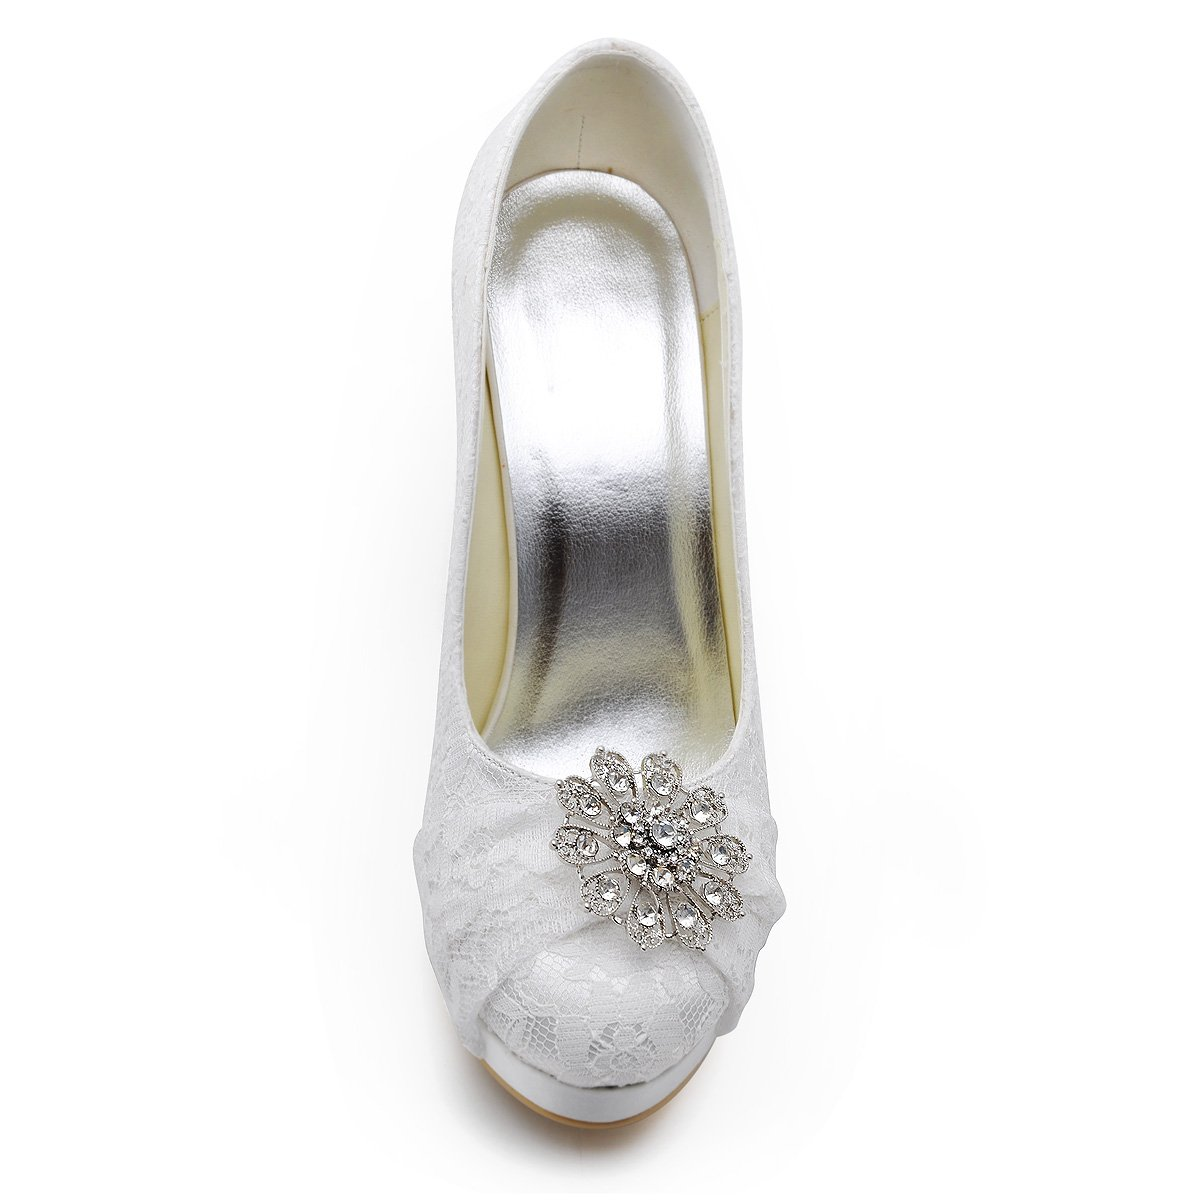 ElegantPark HC1413P Women Pumps Closed Toe Platform High Heel Buckle Lace Wedding Bridal Shoes B00N9TOD84 11 B(M) US (true fitting 10.5 US)|White